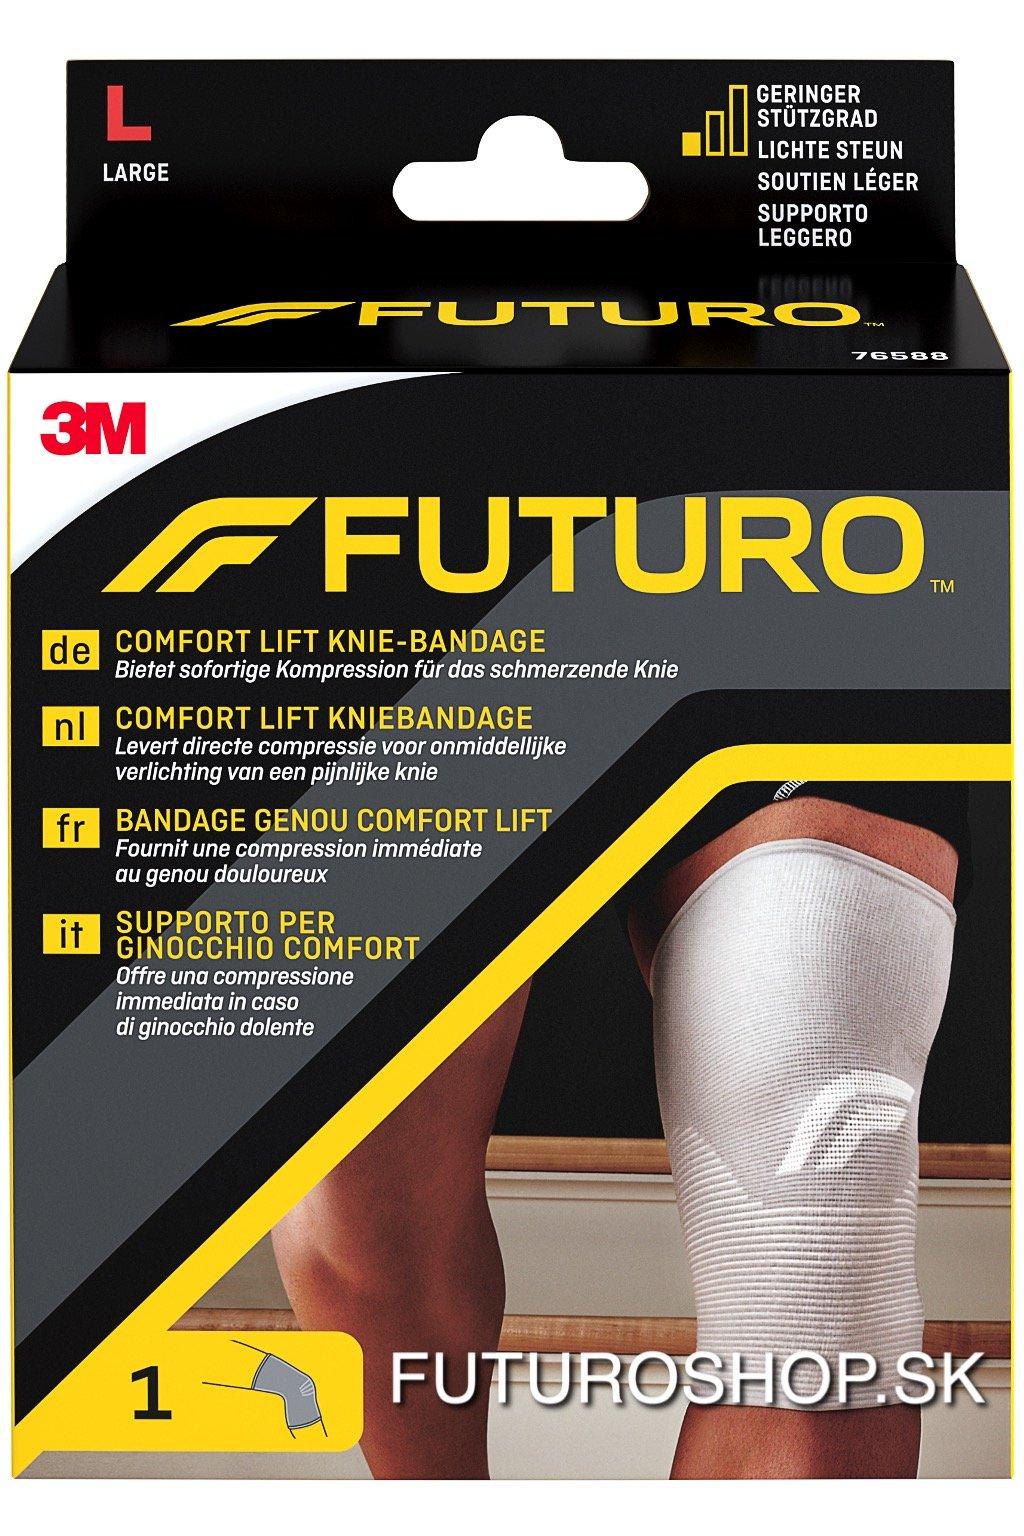 3M FUTURO kolenná bandáž Comfort Lift 76588, veľkosť L